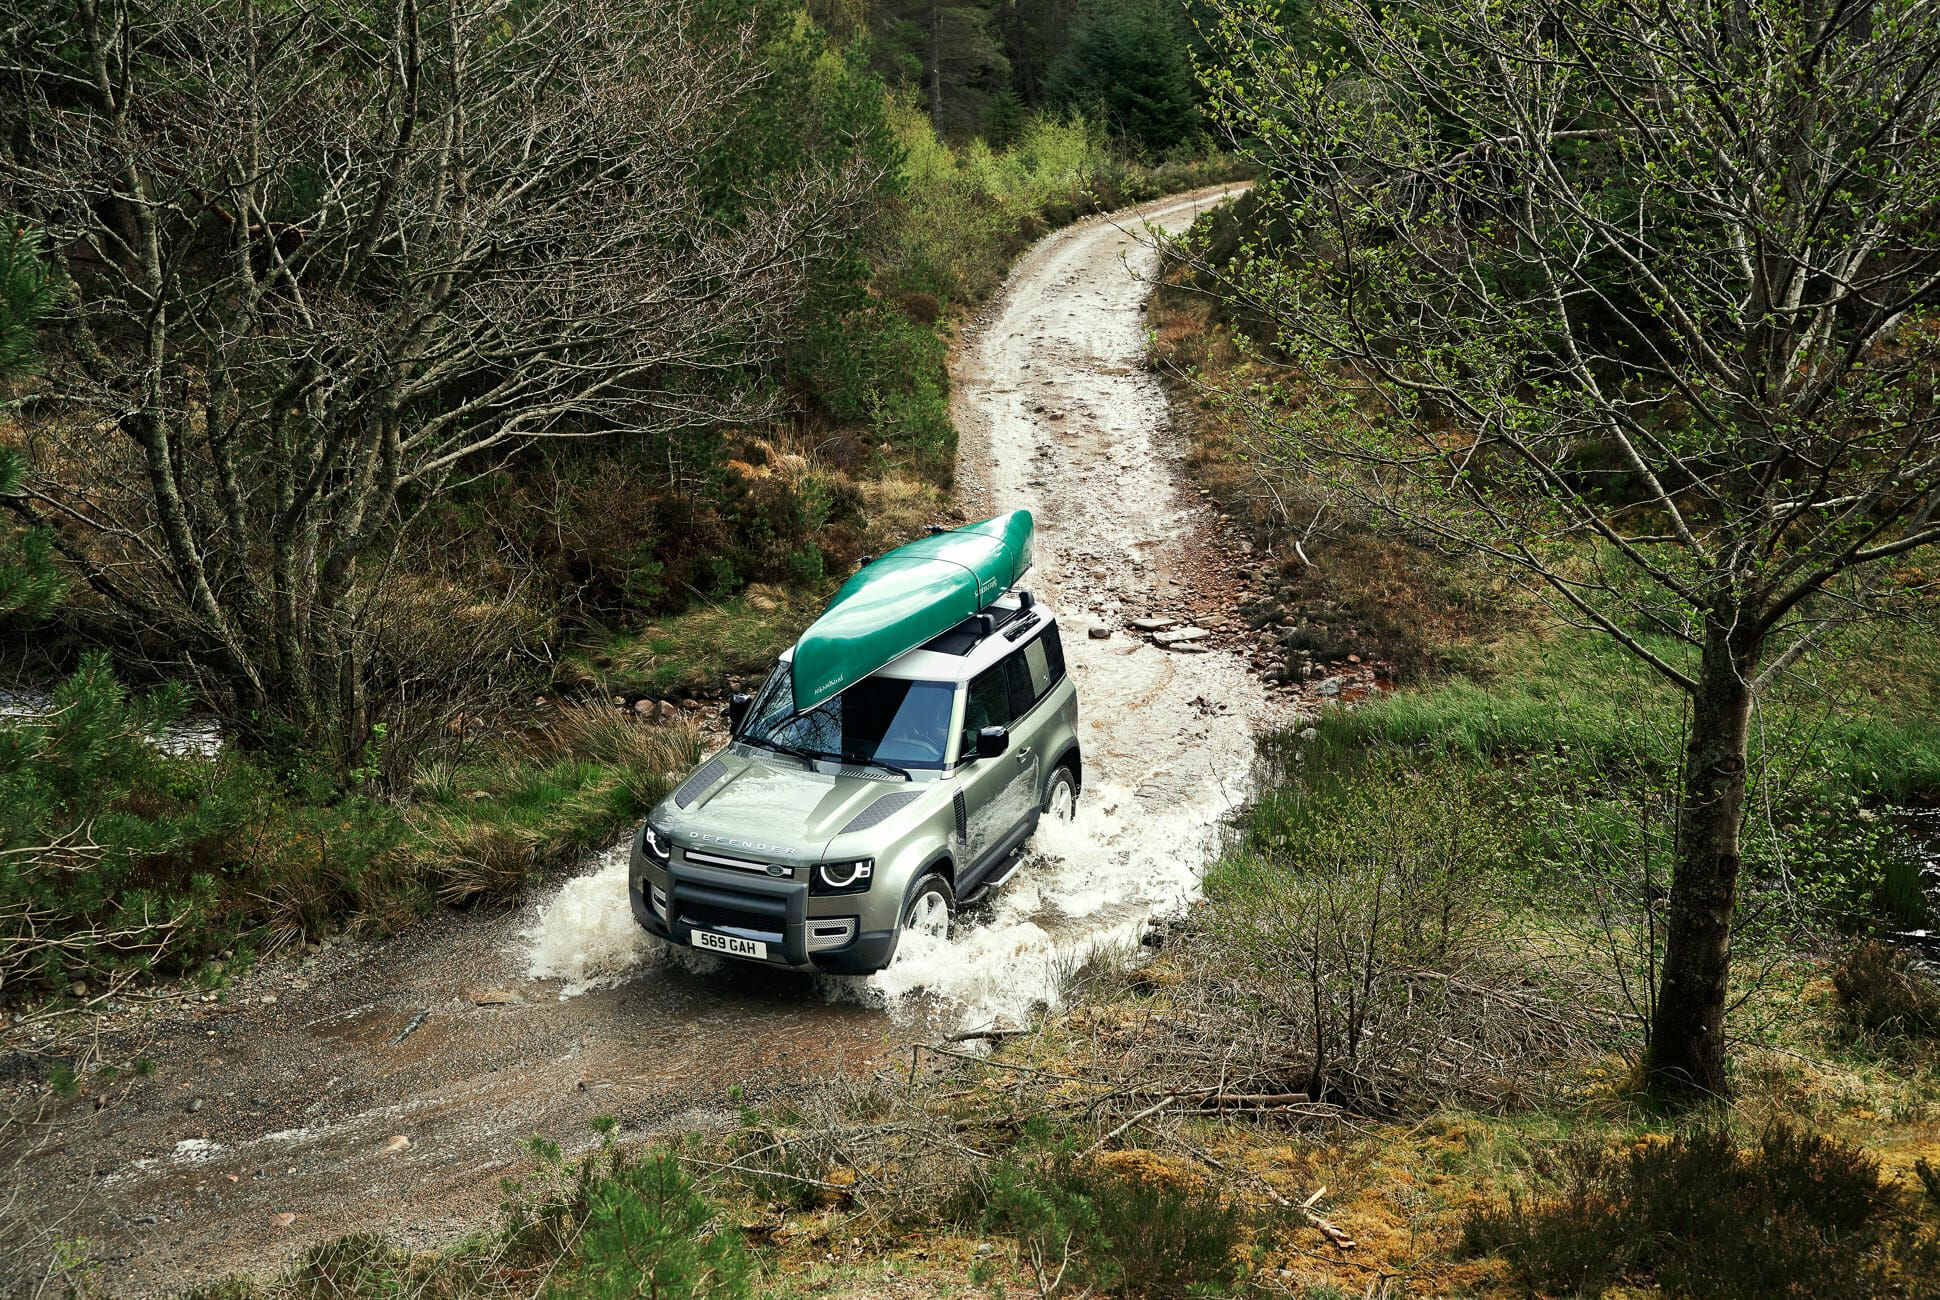 Land Rover Defender Gear Patrol-Exterior Action-Slide-01